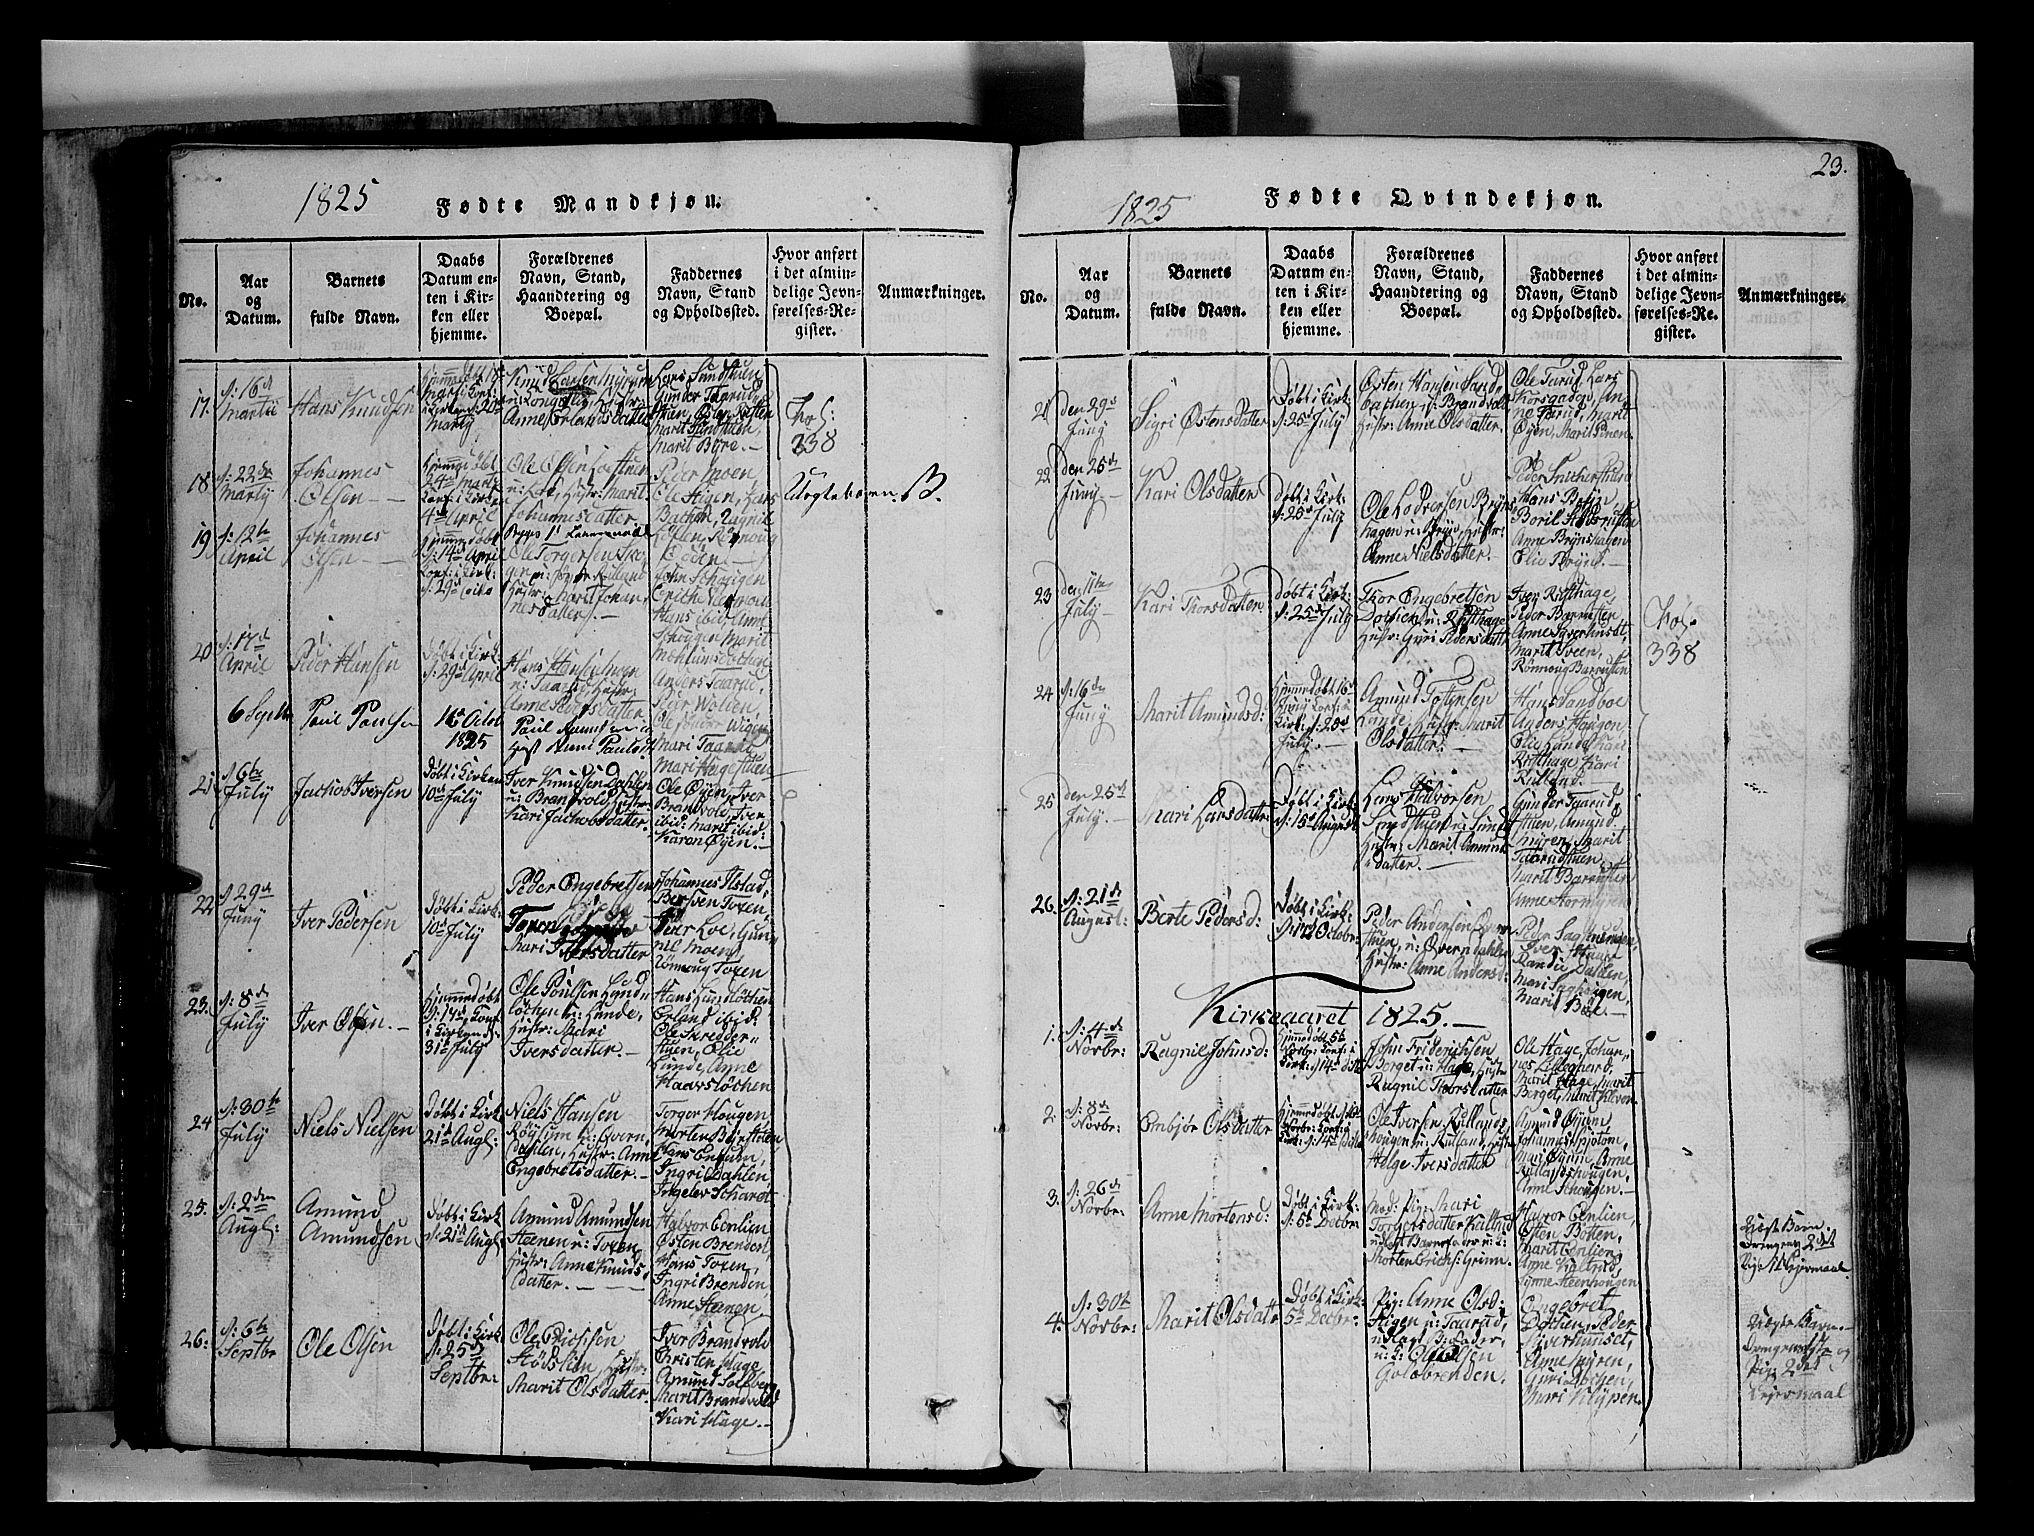 SAH, Fron prestekontor, H/Ha/Hab/L0004: Klokkerbok nr. 4, 1816-1850, s. 23